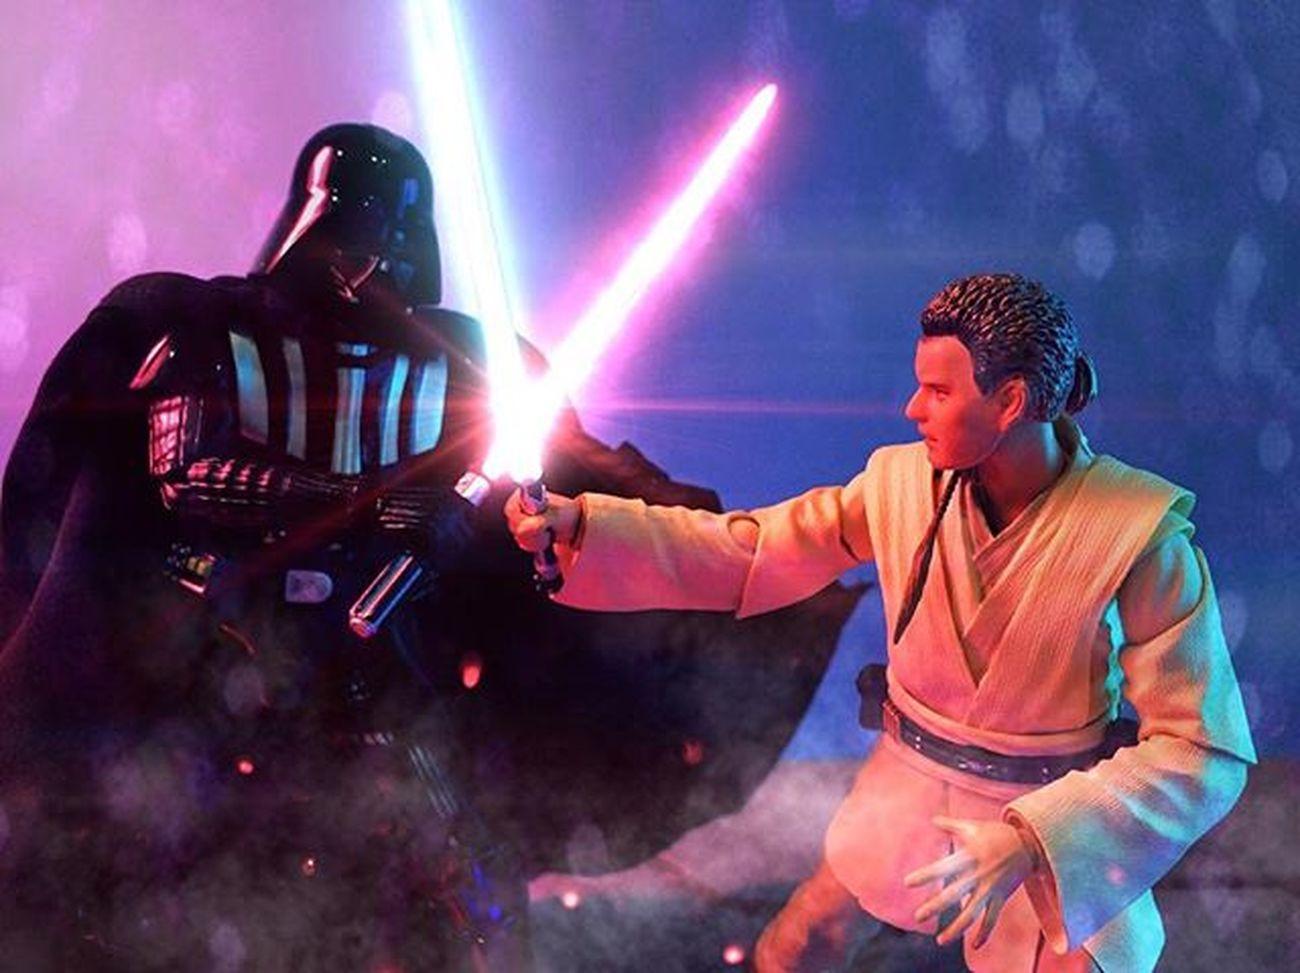 "Obi Wan : ""You were my brother, Anakin. I loved you."" ............................................................... AnakinSkywalker Darthvader MafexVader Obiwankenobi Obiwan Jedi Jedimaster Sith Sithlord SHfiguarts Shfiguartsphotography Starwars Starwarstoys StarWars6inch Starwarstoyphotography Revengeofthesith Starwarstoypix"